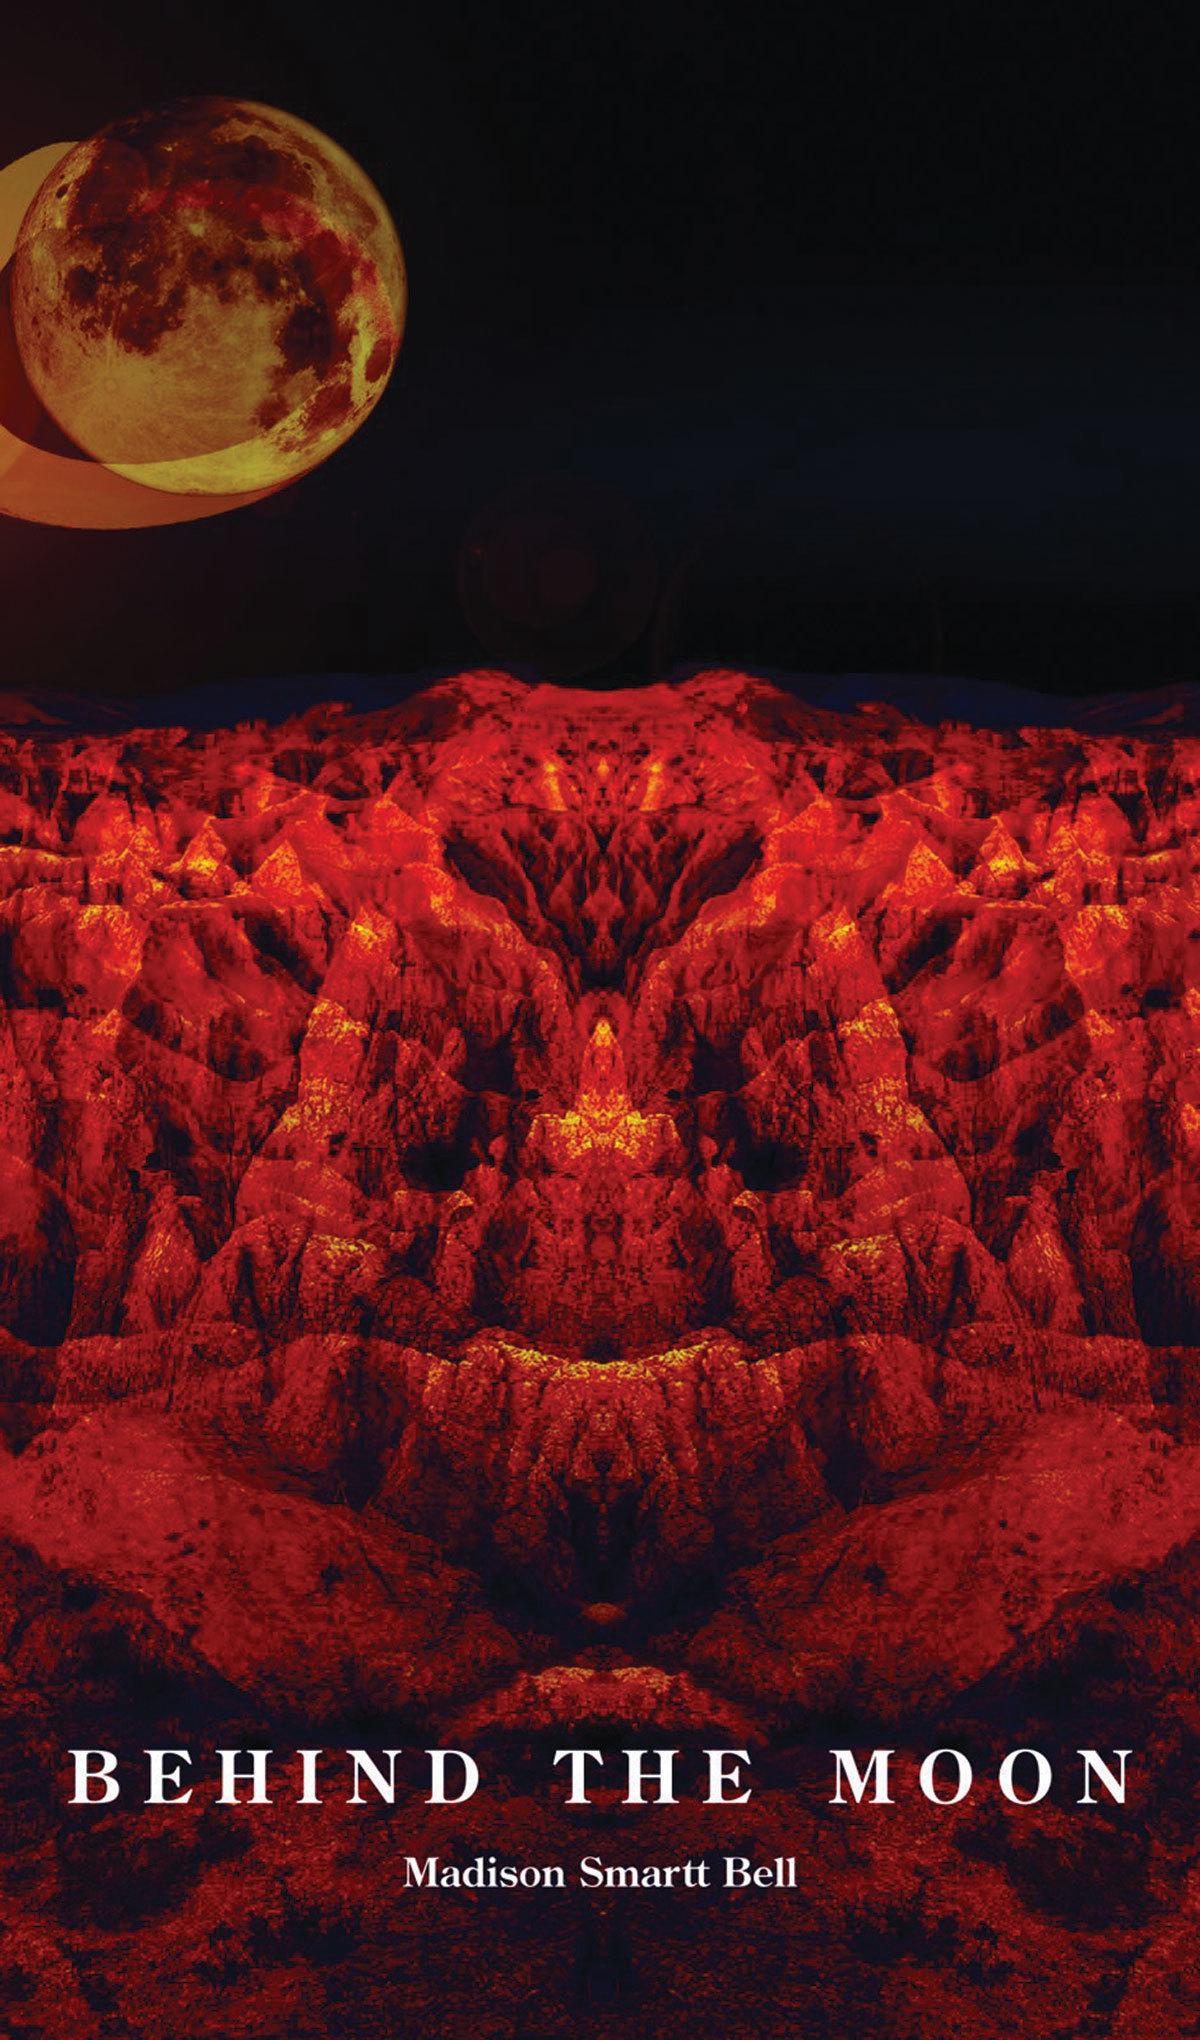 behind-the-moon_Reviews.jpg#asset:47393